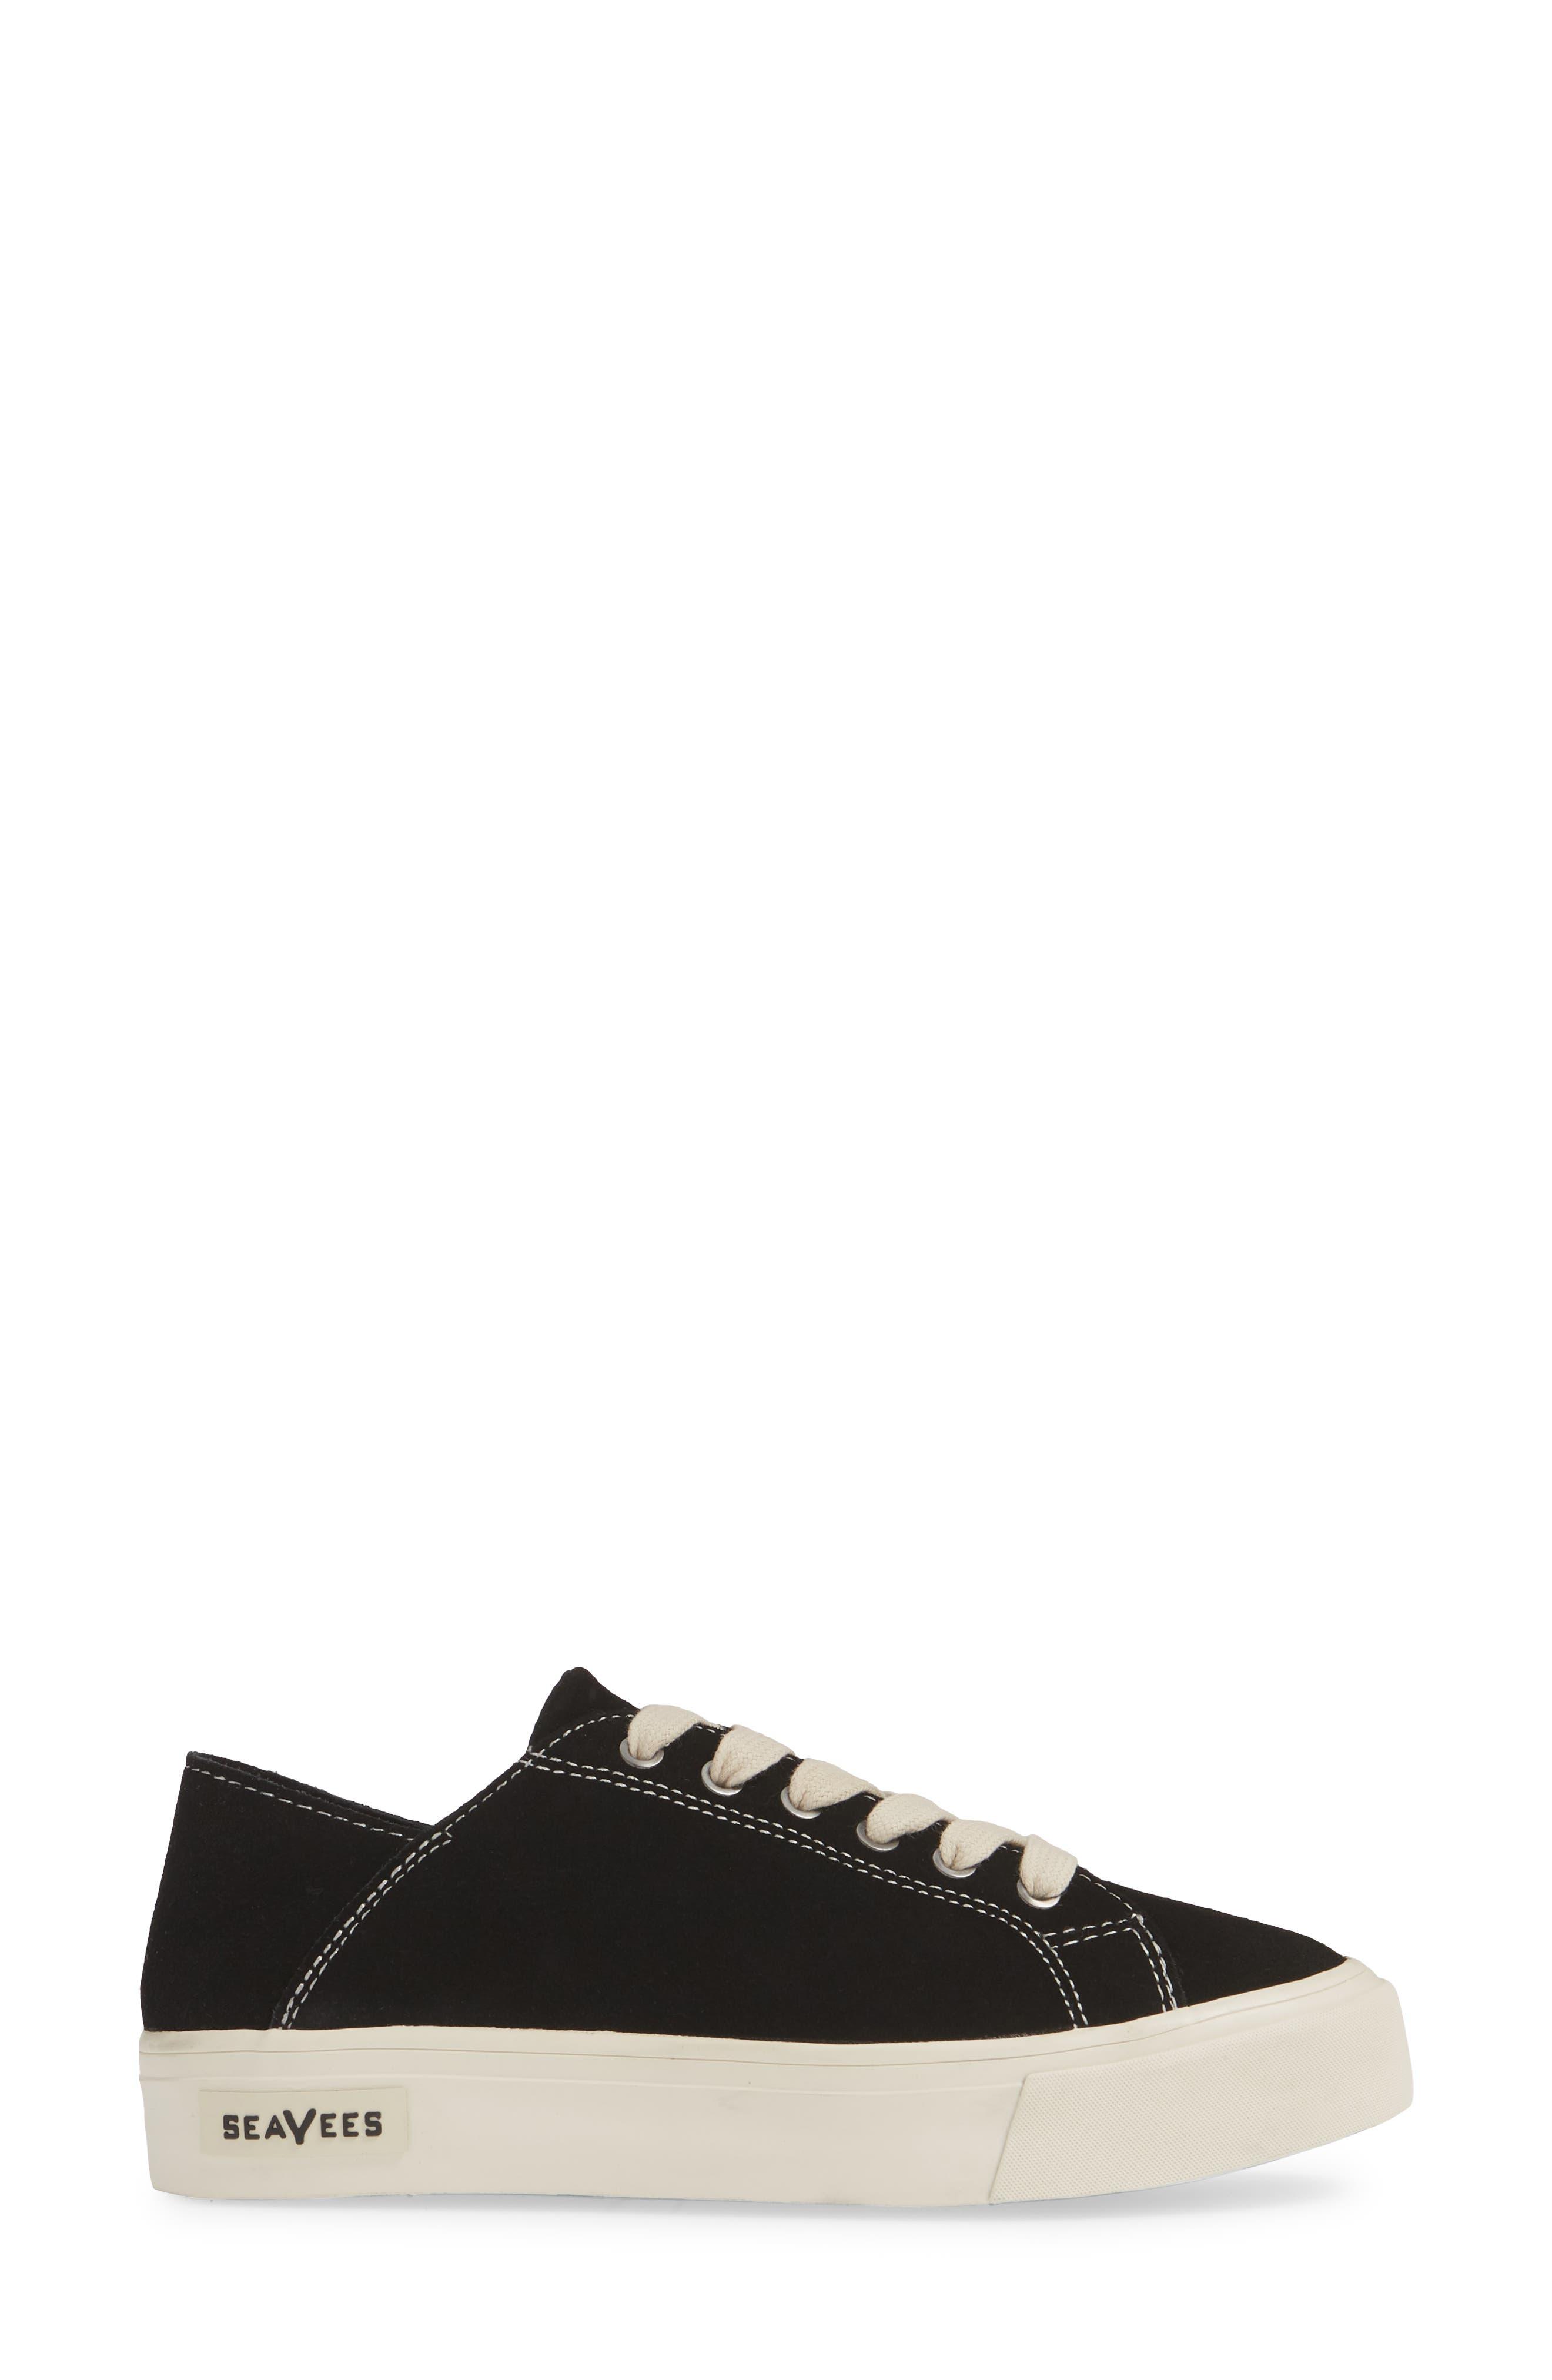 SEAVEES,                             Sausalito Sneaker,                             Alternate thumbnail 3, color,                             BLACK/ BLACK